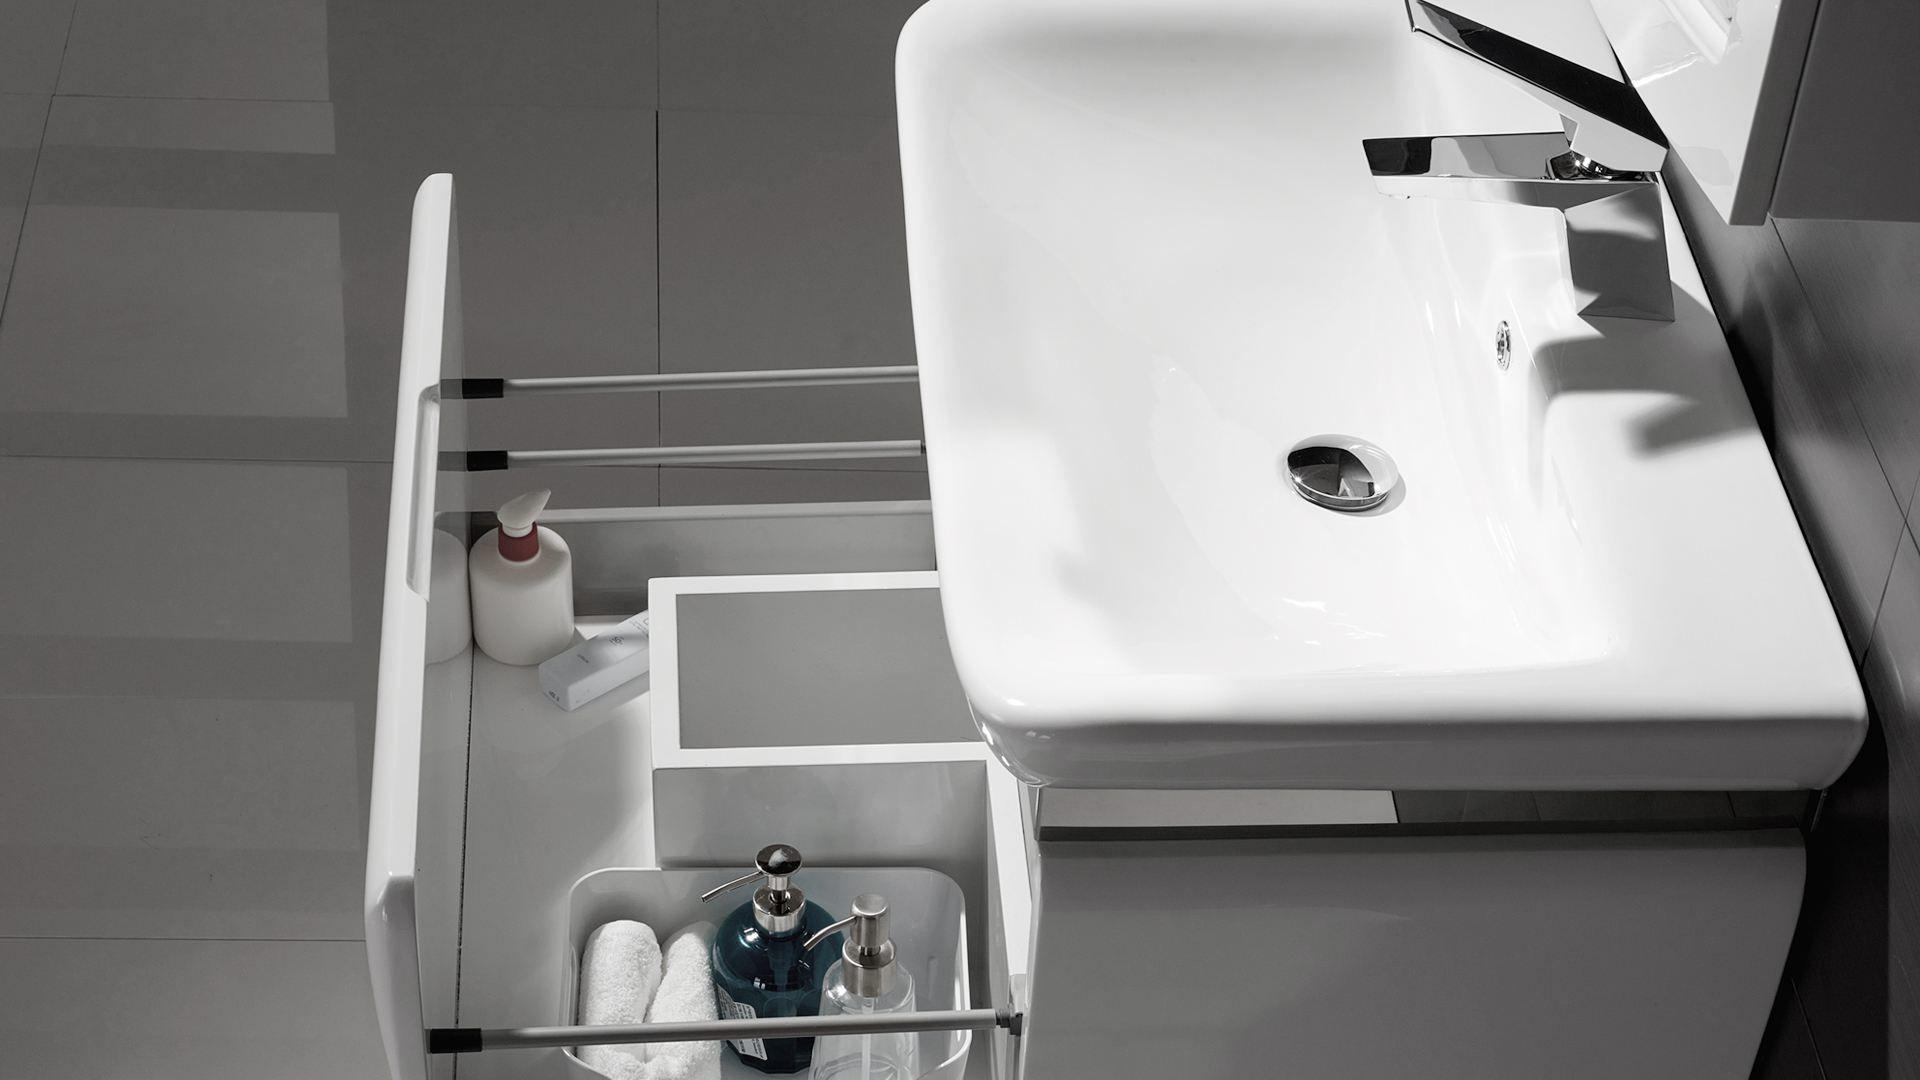 Produktfotografie, Produktfoto, Bad, Toilette, WC